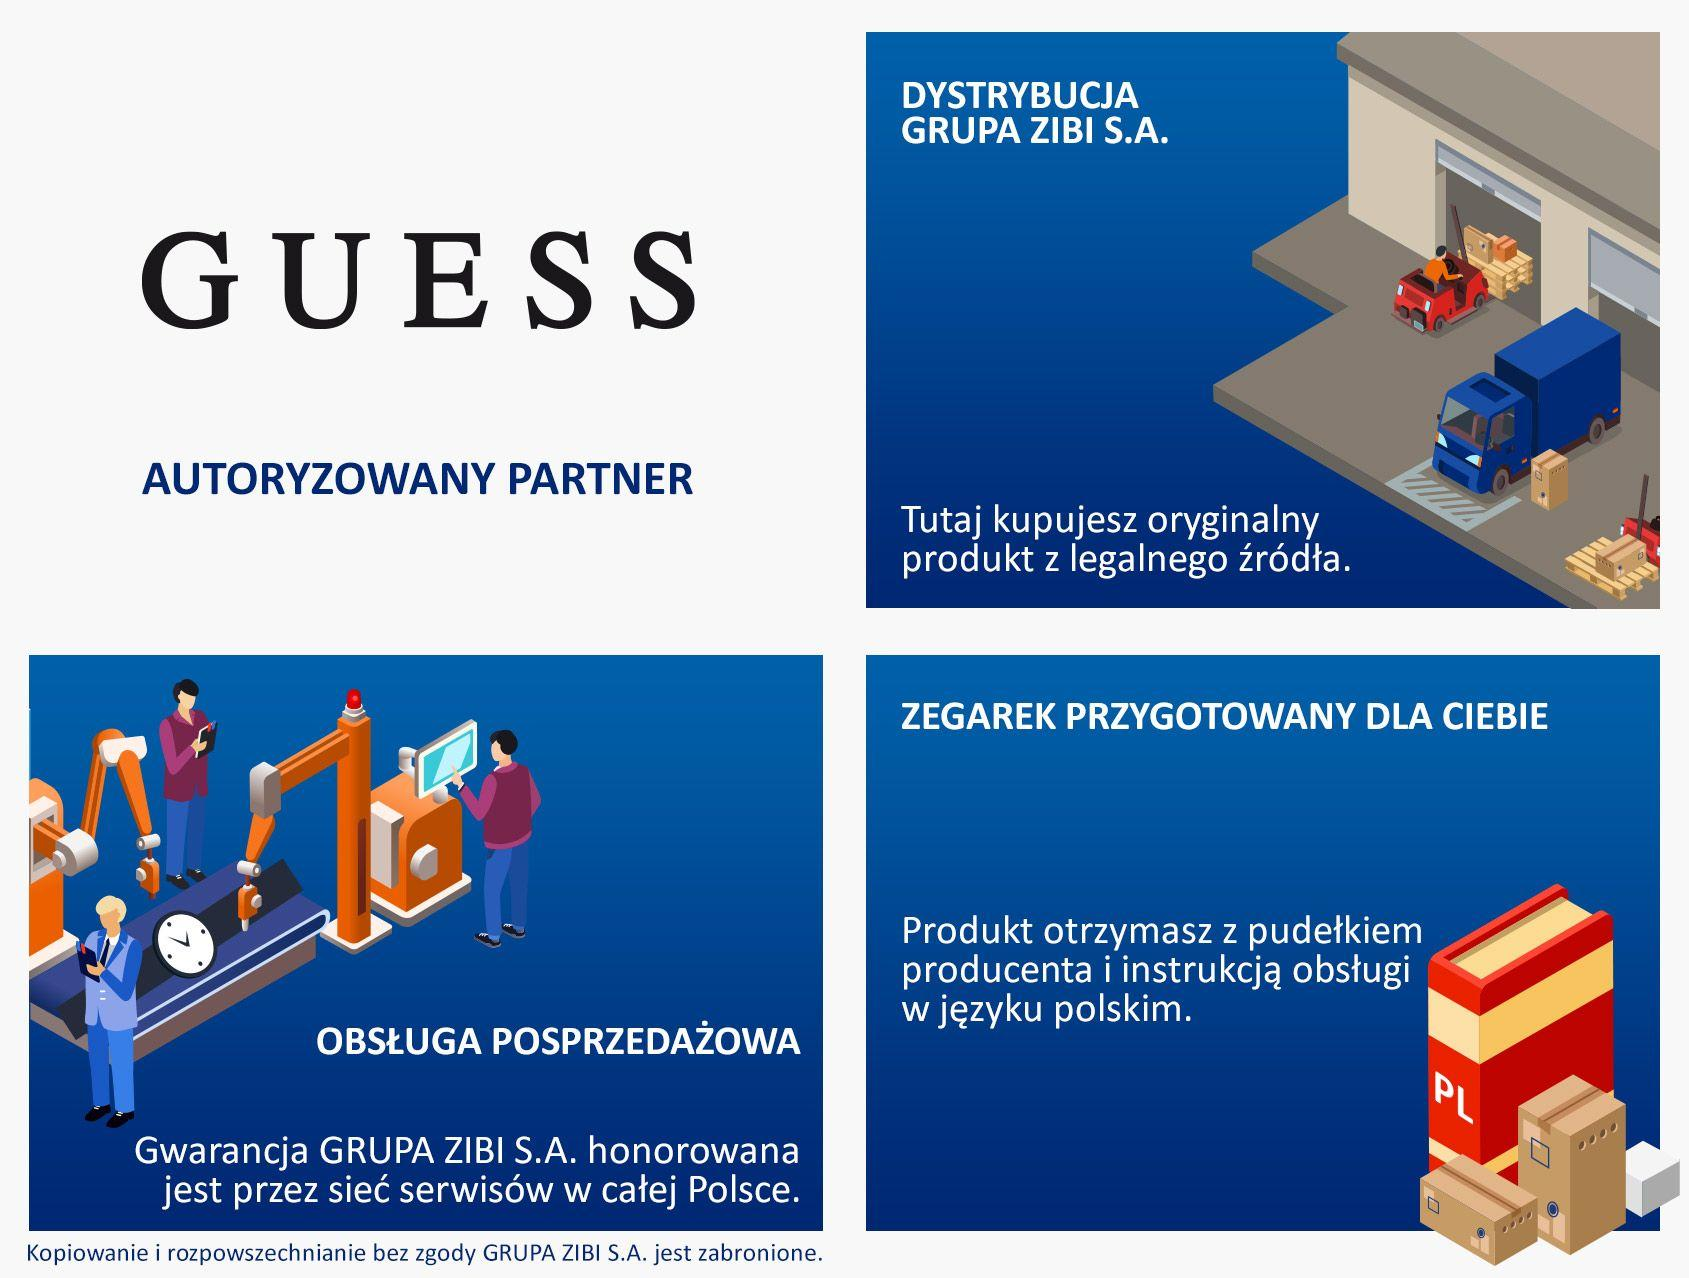 Autoryzowany Partner Guess